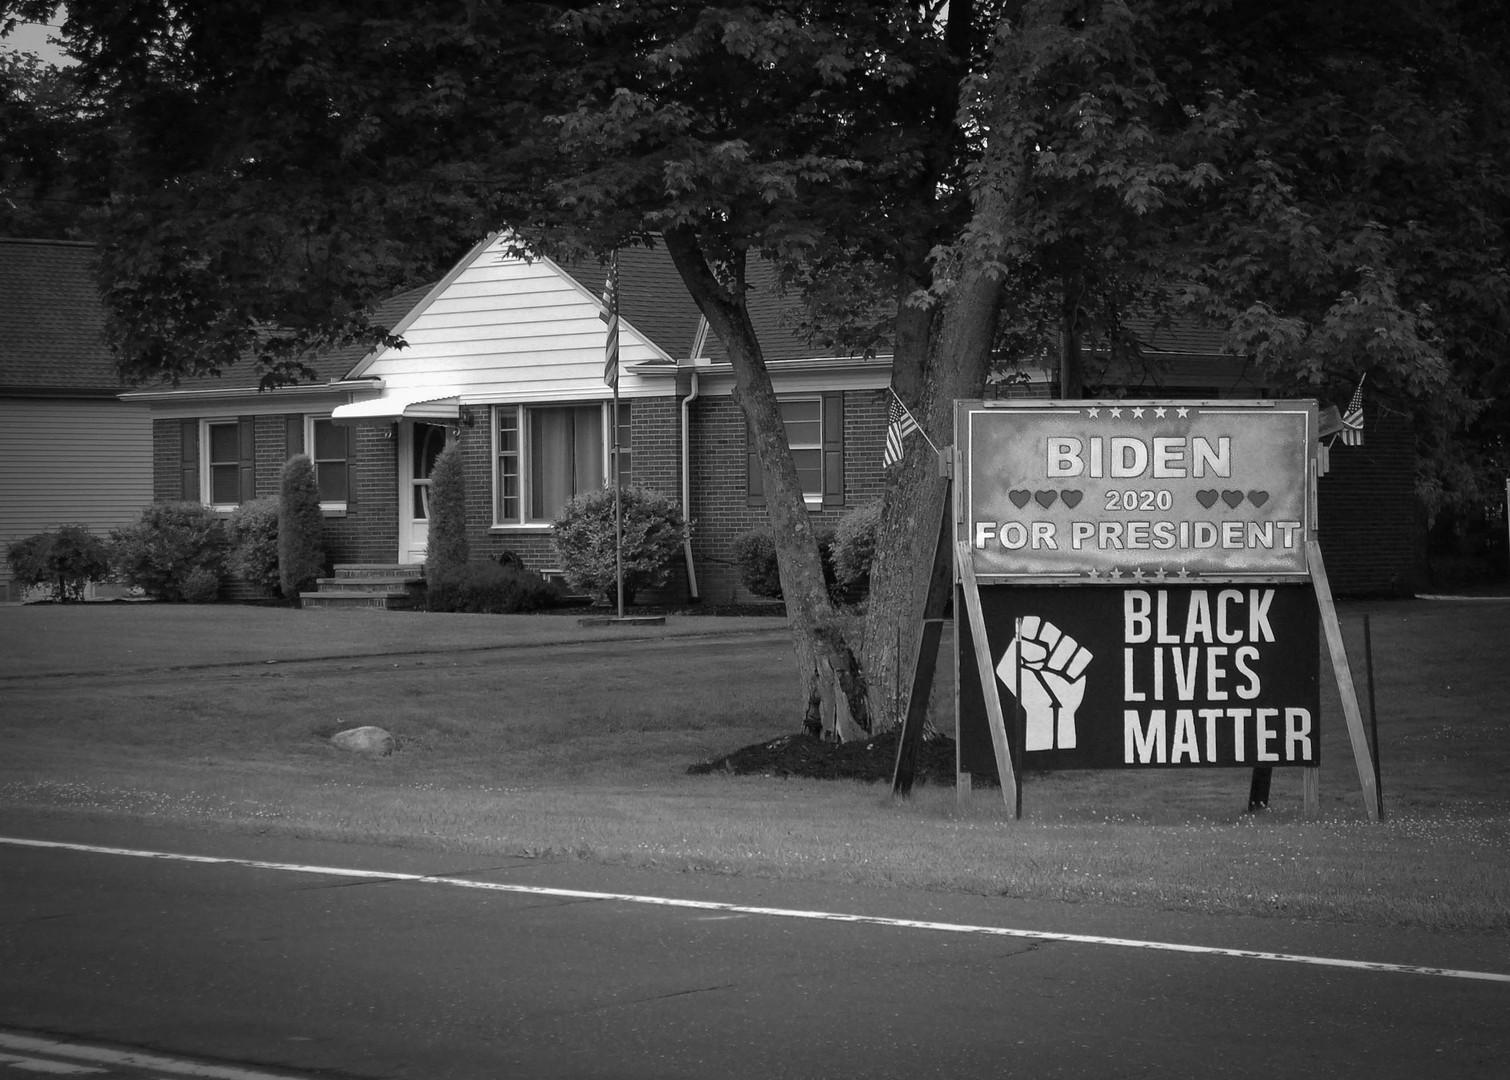 Biden / Black Lives Matter